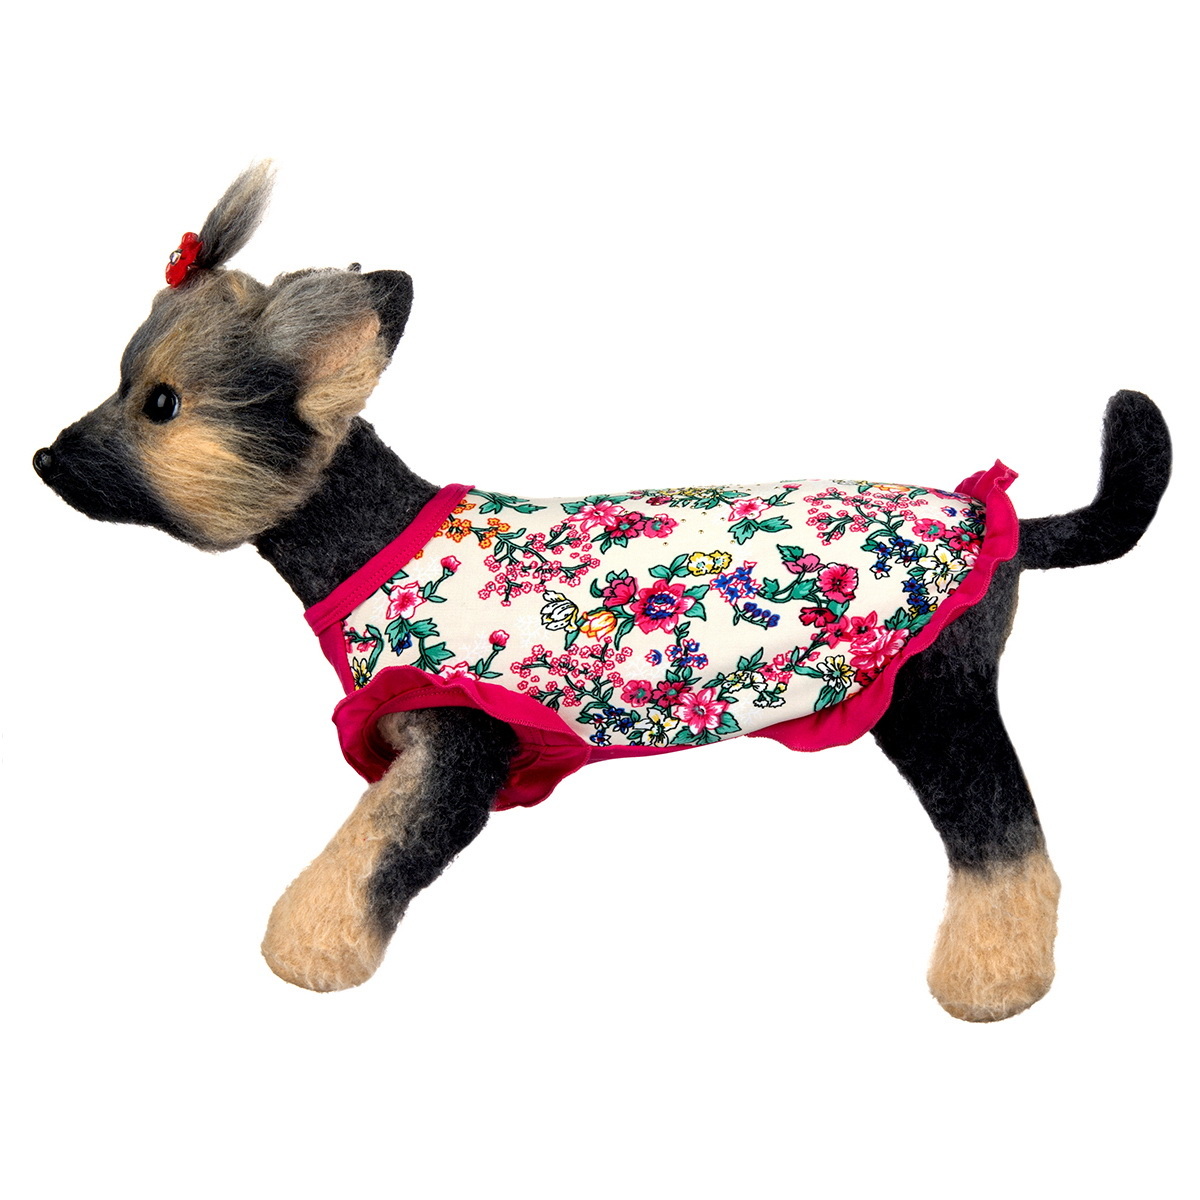 "Майка для собак Dogmoda ""Оливия"", для девочки. Размер 4 (XL)"